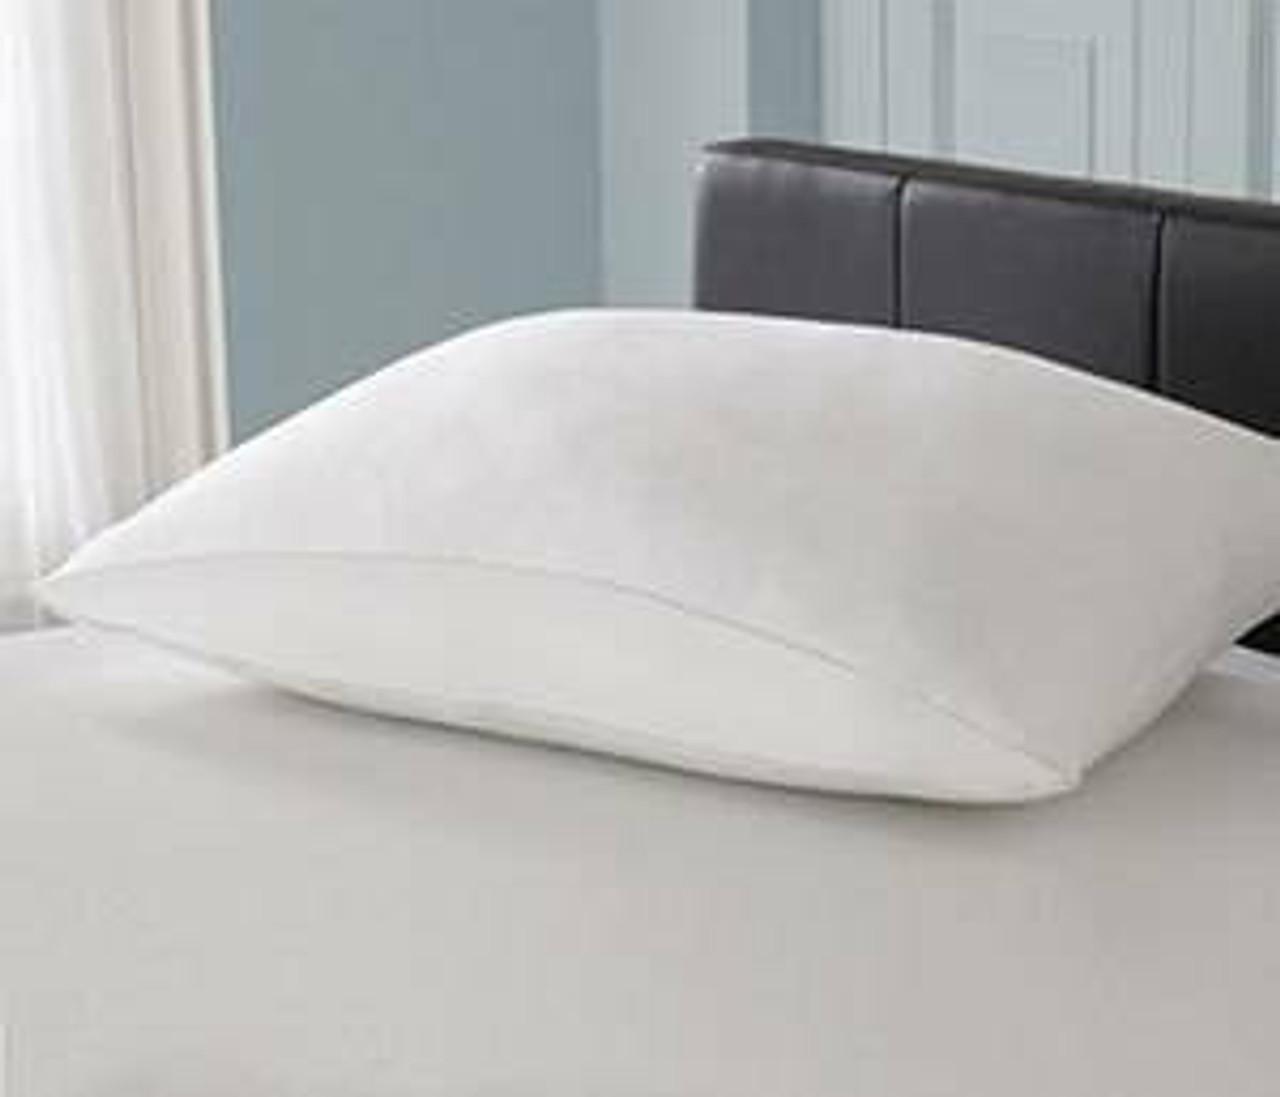 Restful Nights Restful Nights Pillows or Superside Line